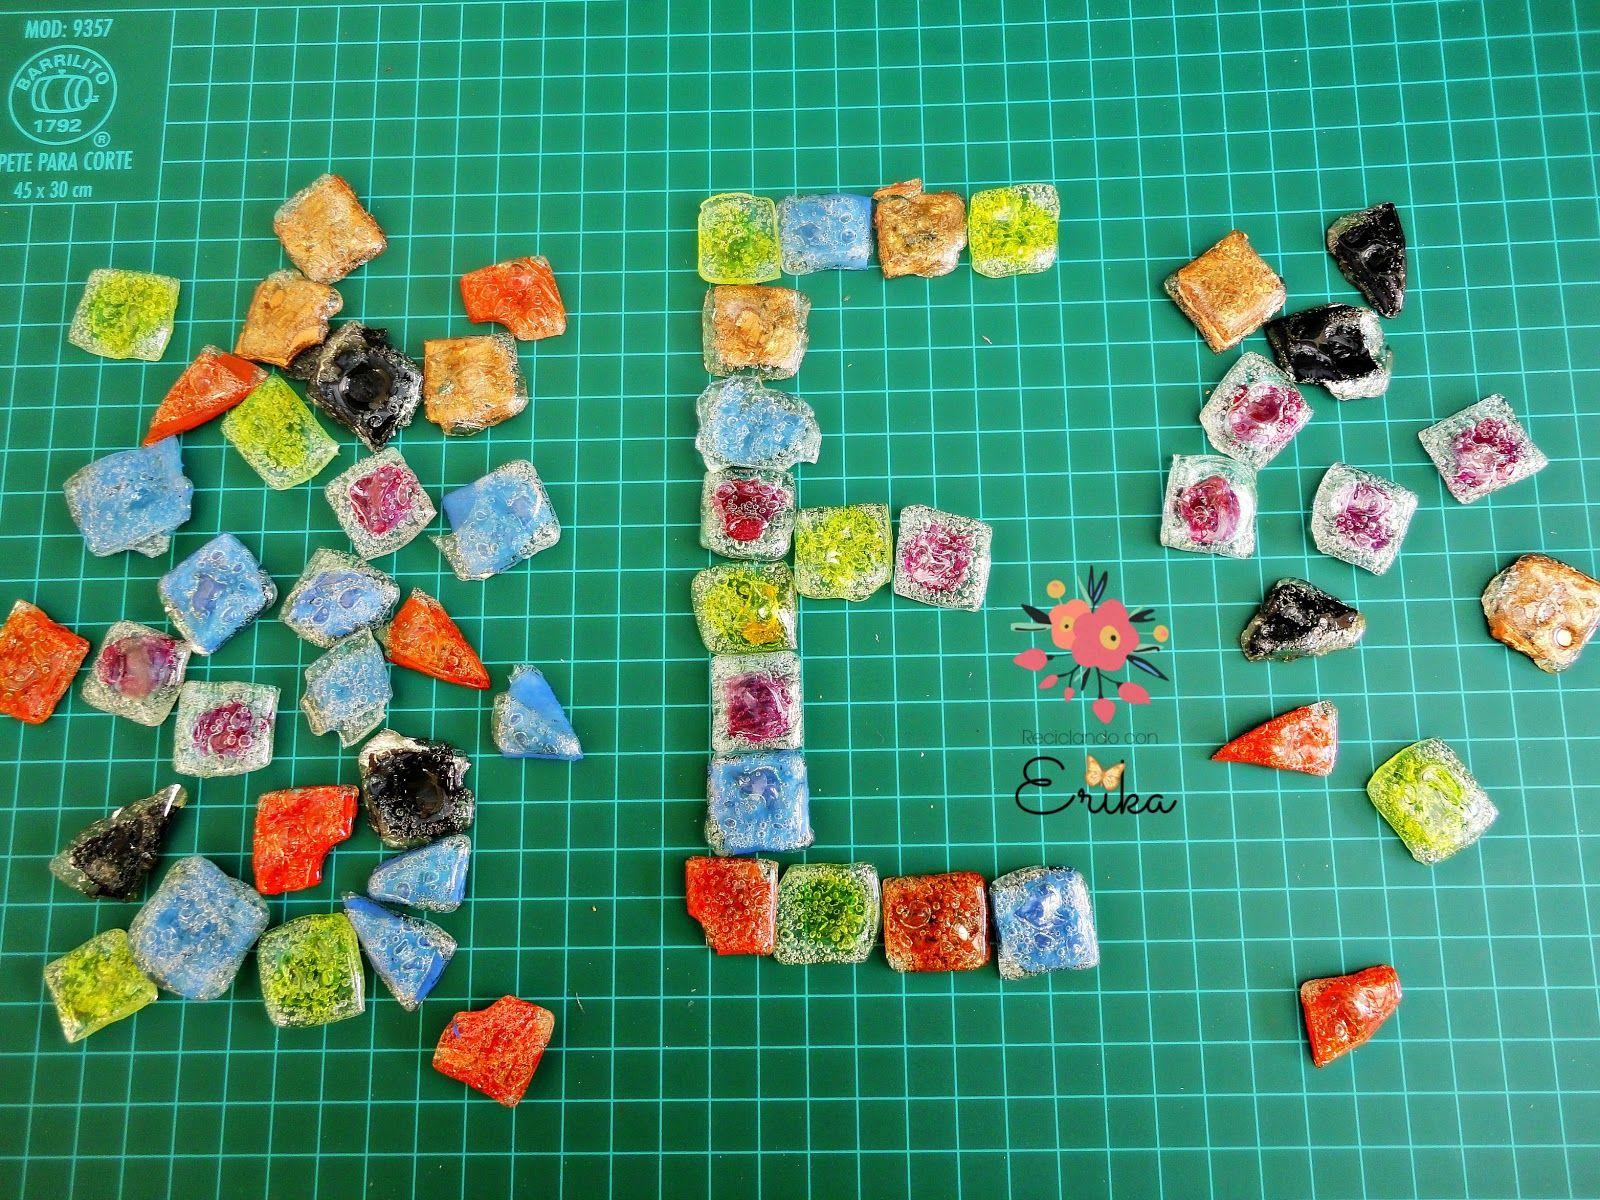 Reciclando con Erika : Teselas o azulejos con cd reciclados, tutorial completo paso a paso